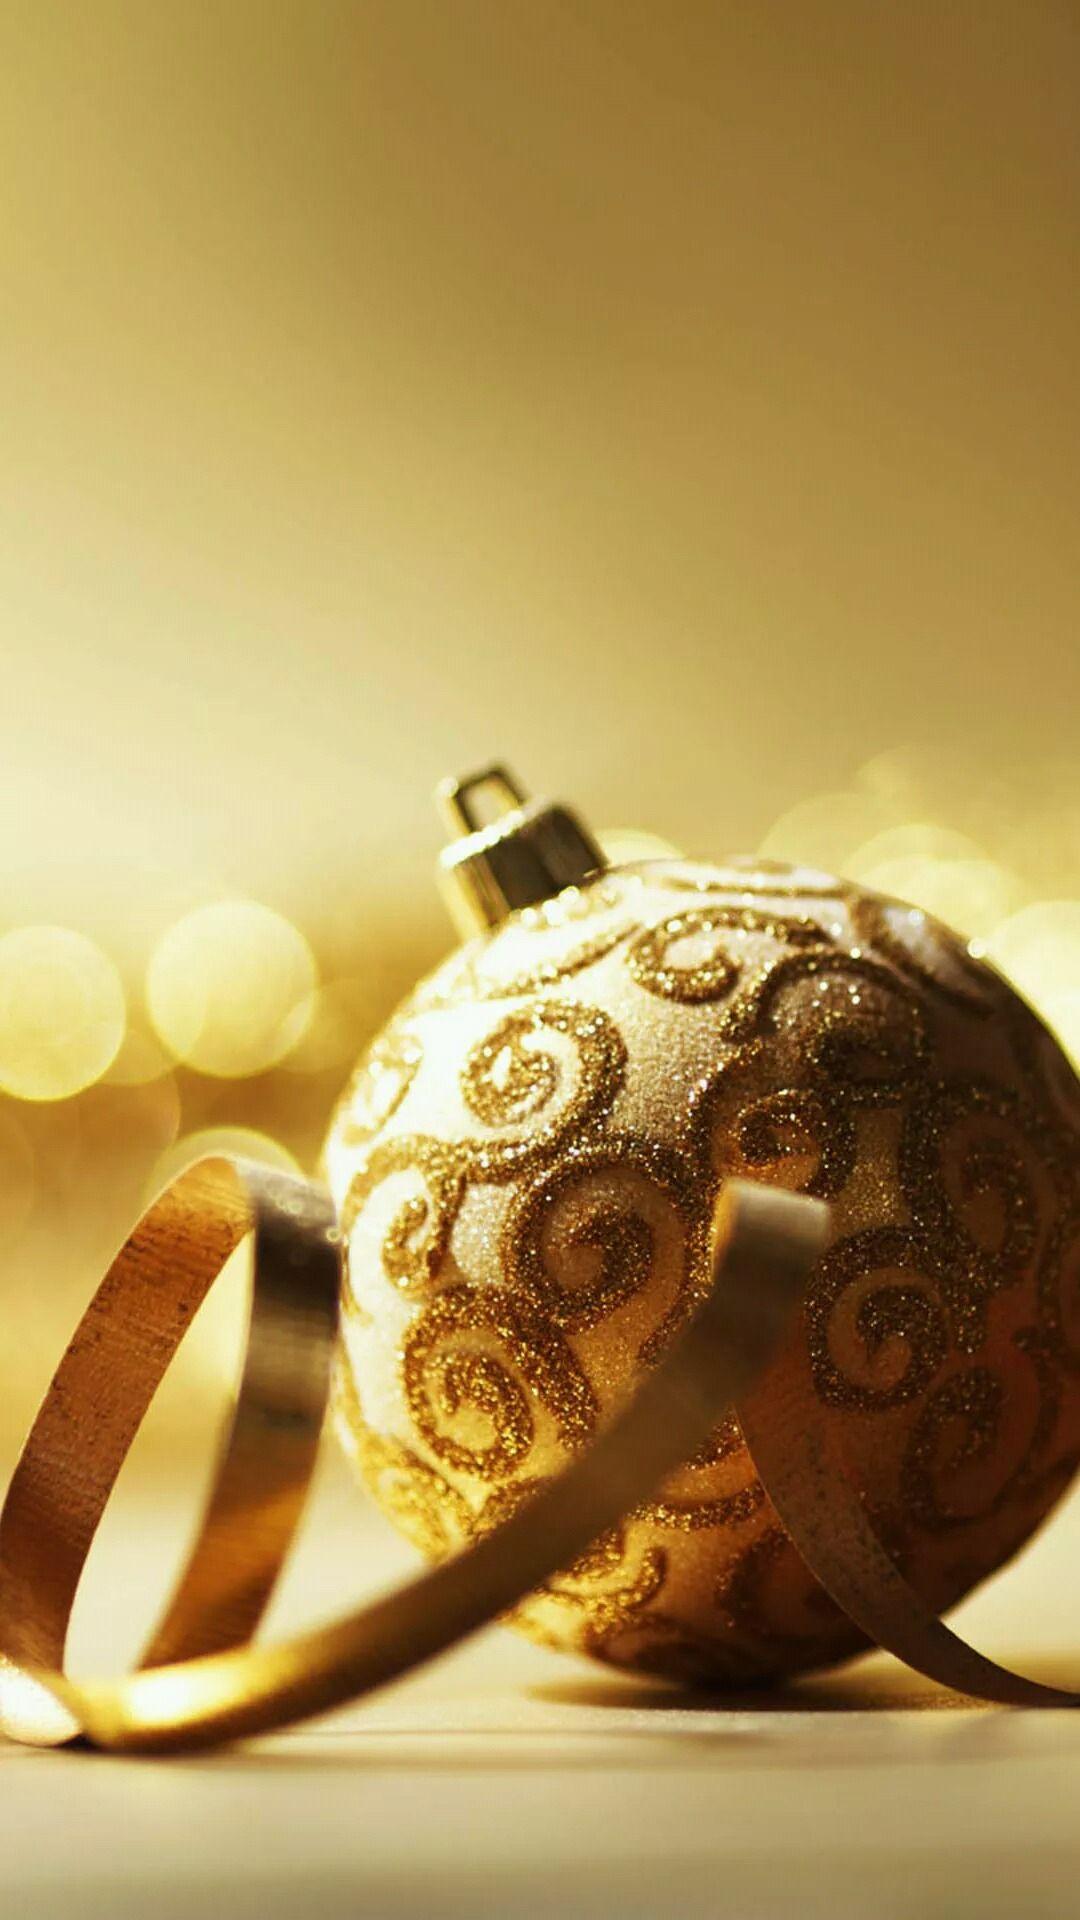 Golden Elegant Christmas Ornaments Iphone Wallpapers Merry